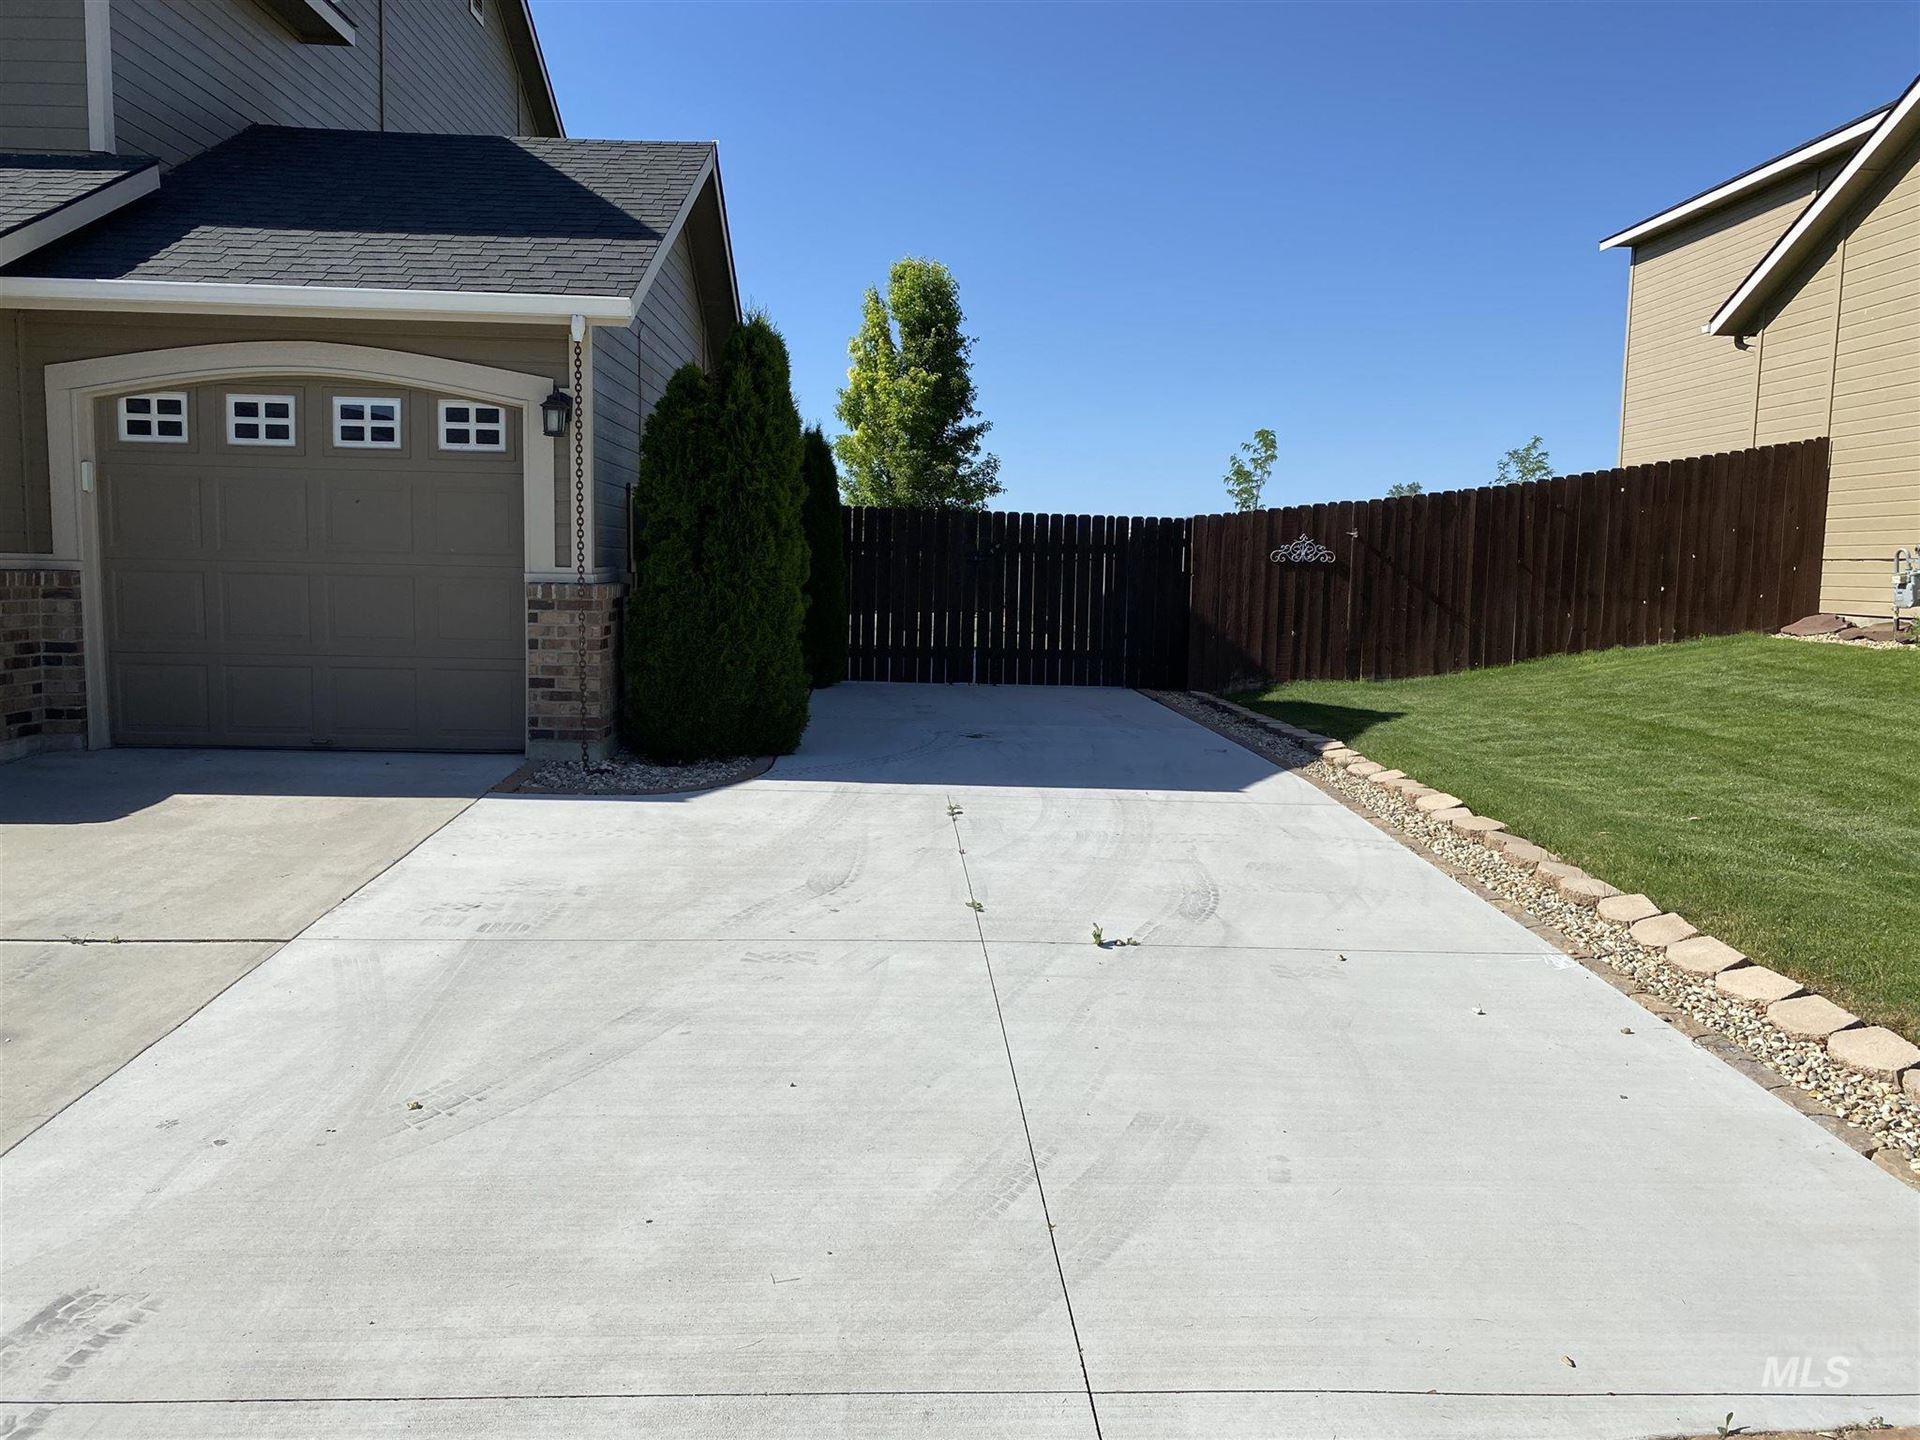 Photo of 1450 NE Urwin, Mountain Home, ID 83647 (MLS # 98807062)